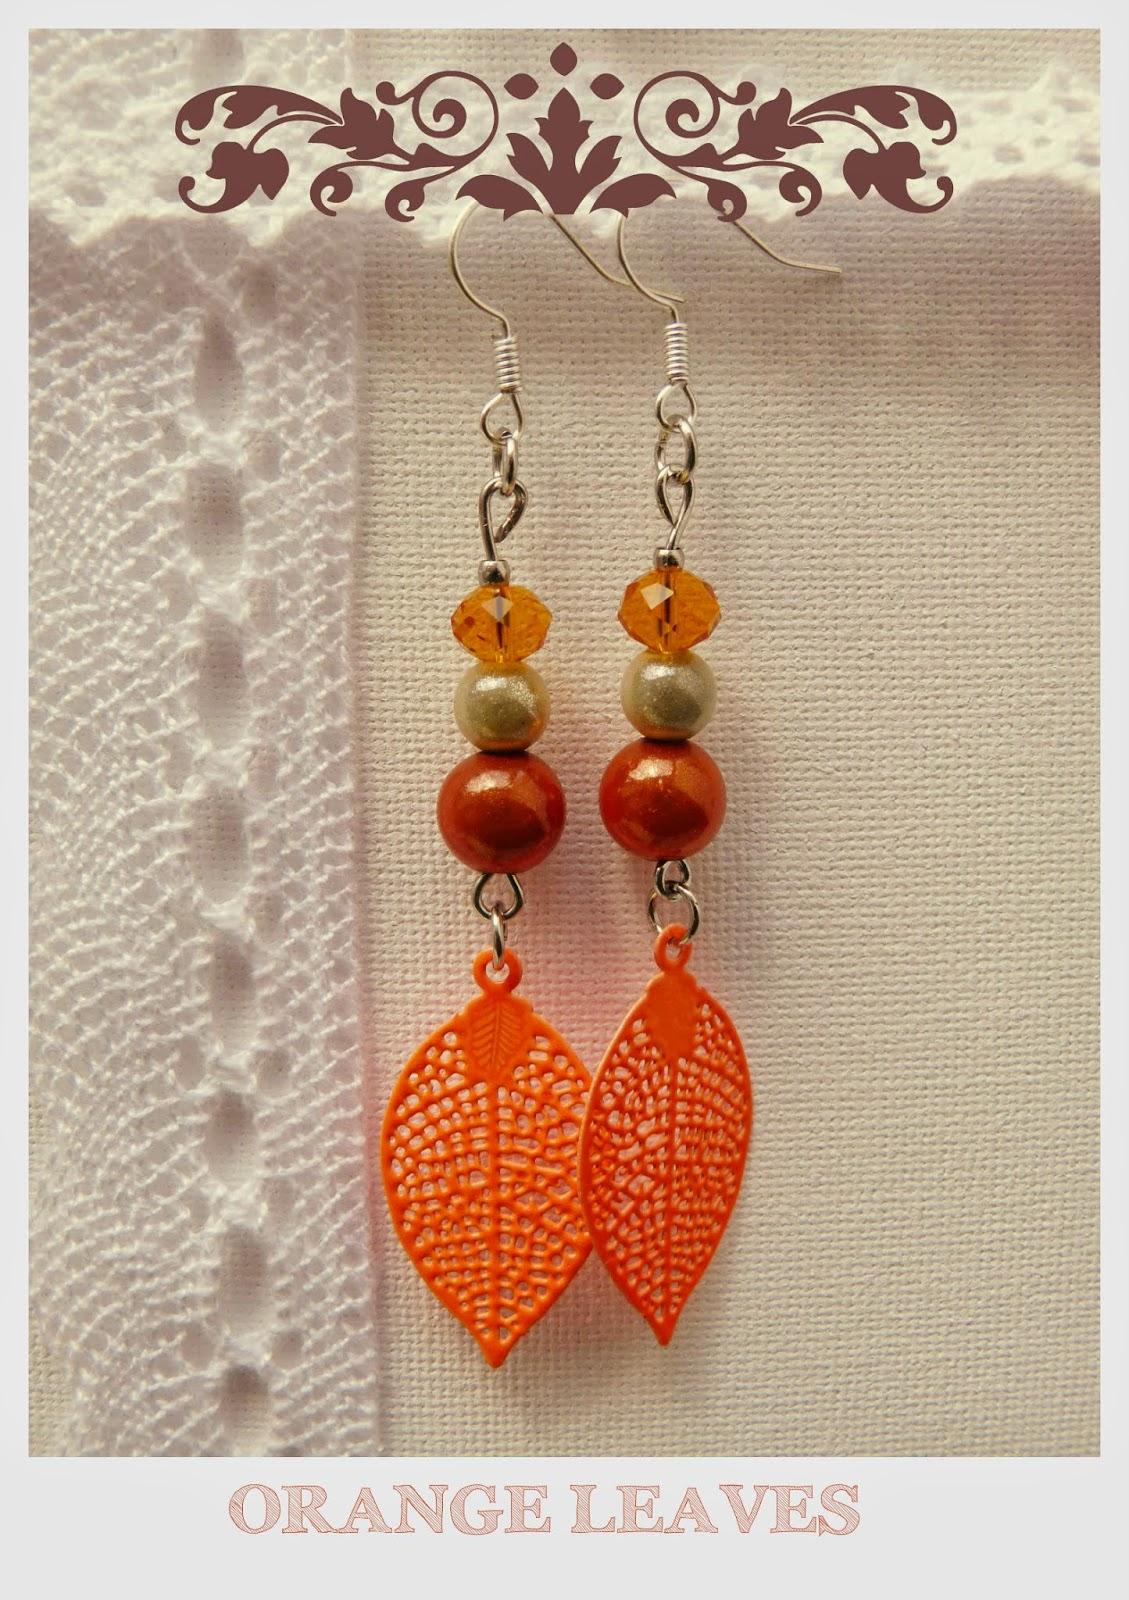 http://www.alittlemarket.com/boucles-d-oreille/fr_boucles_d_oreilles_super_flashy_orange_leaves_-9374585.html